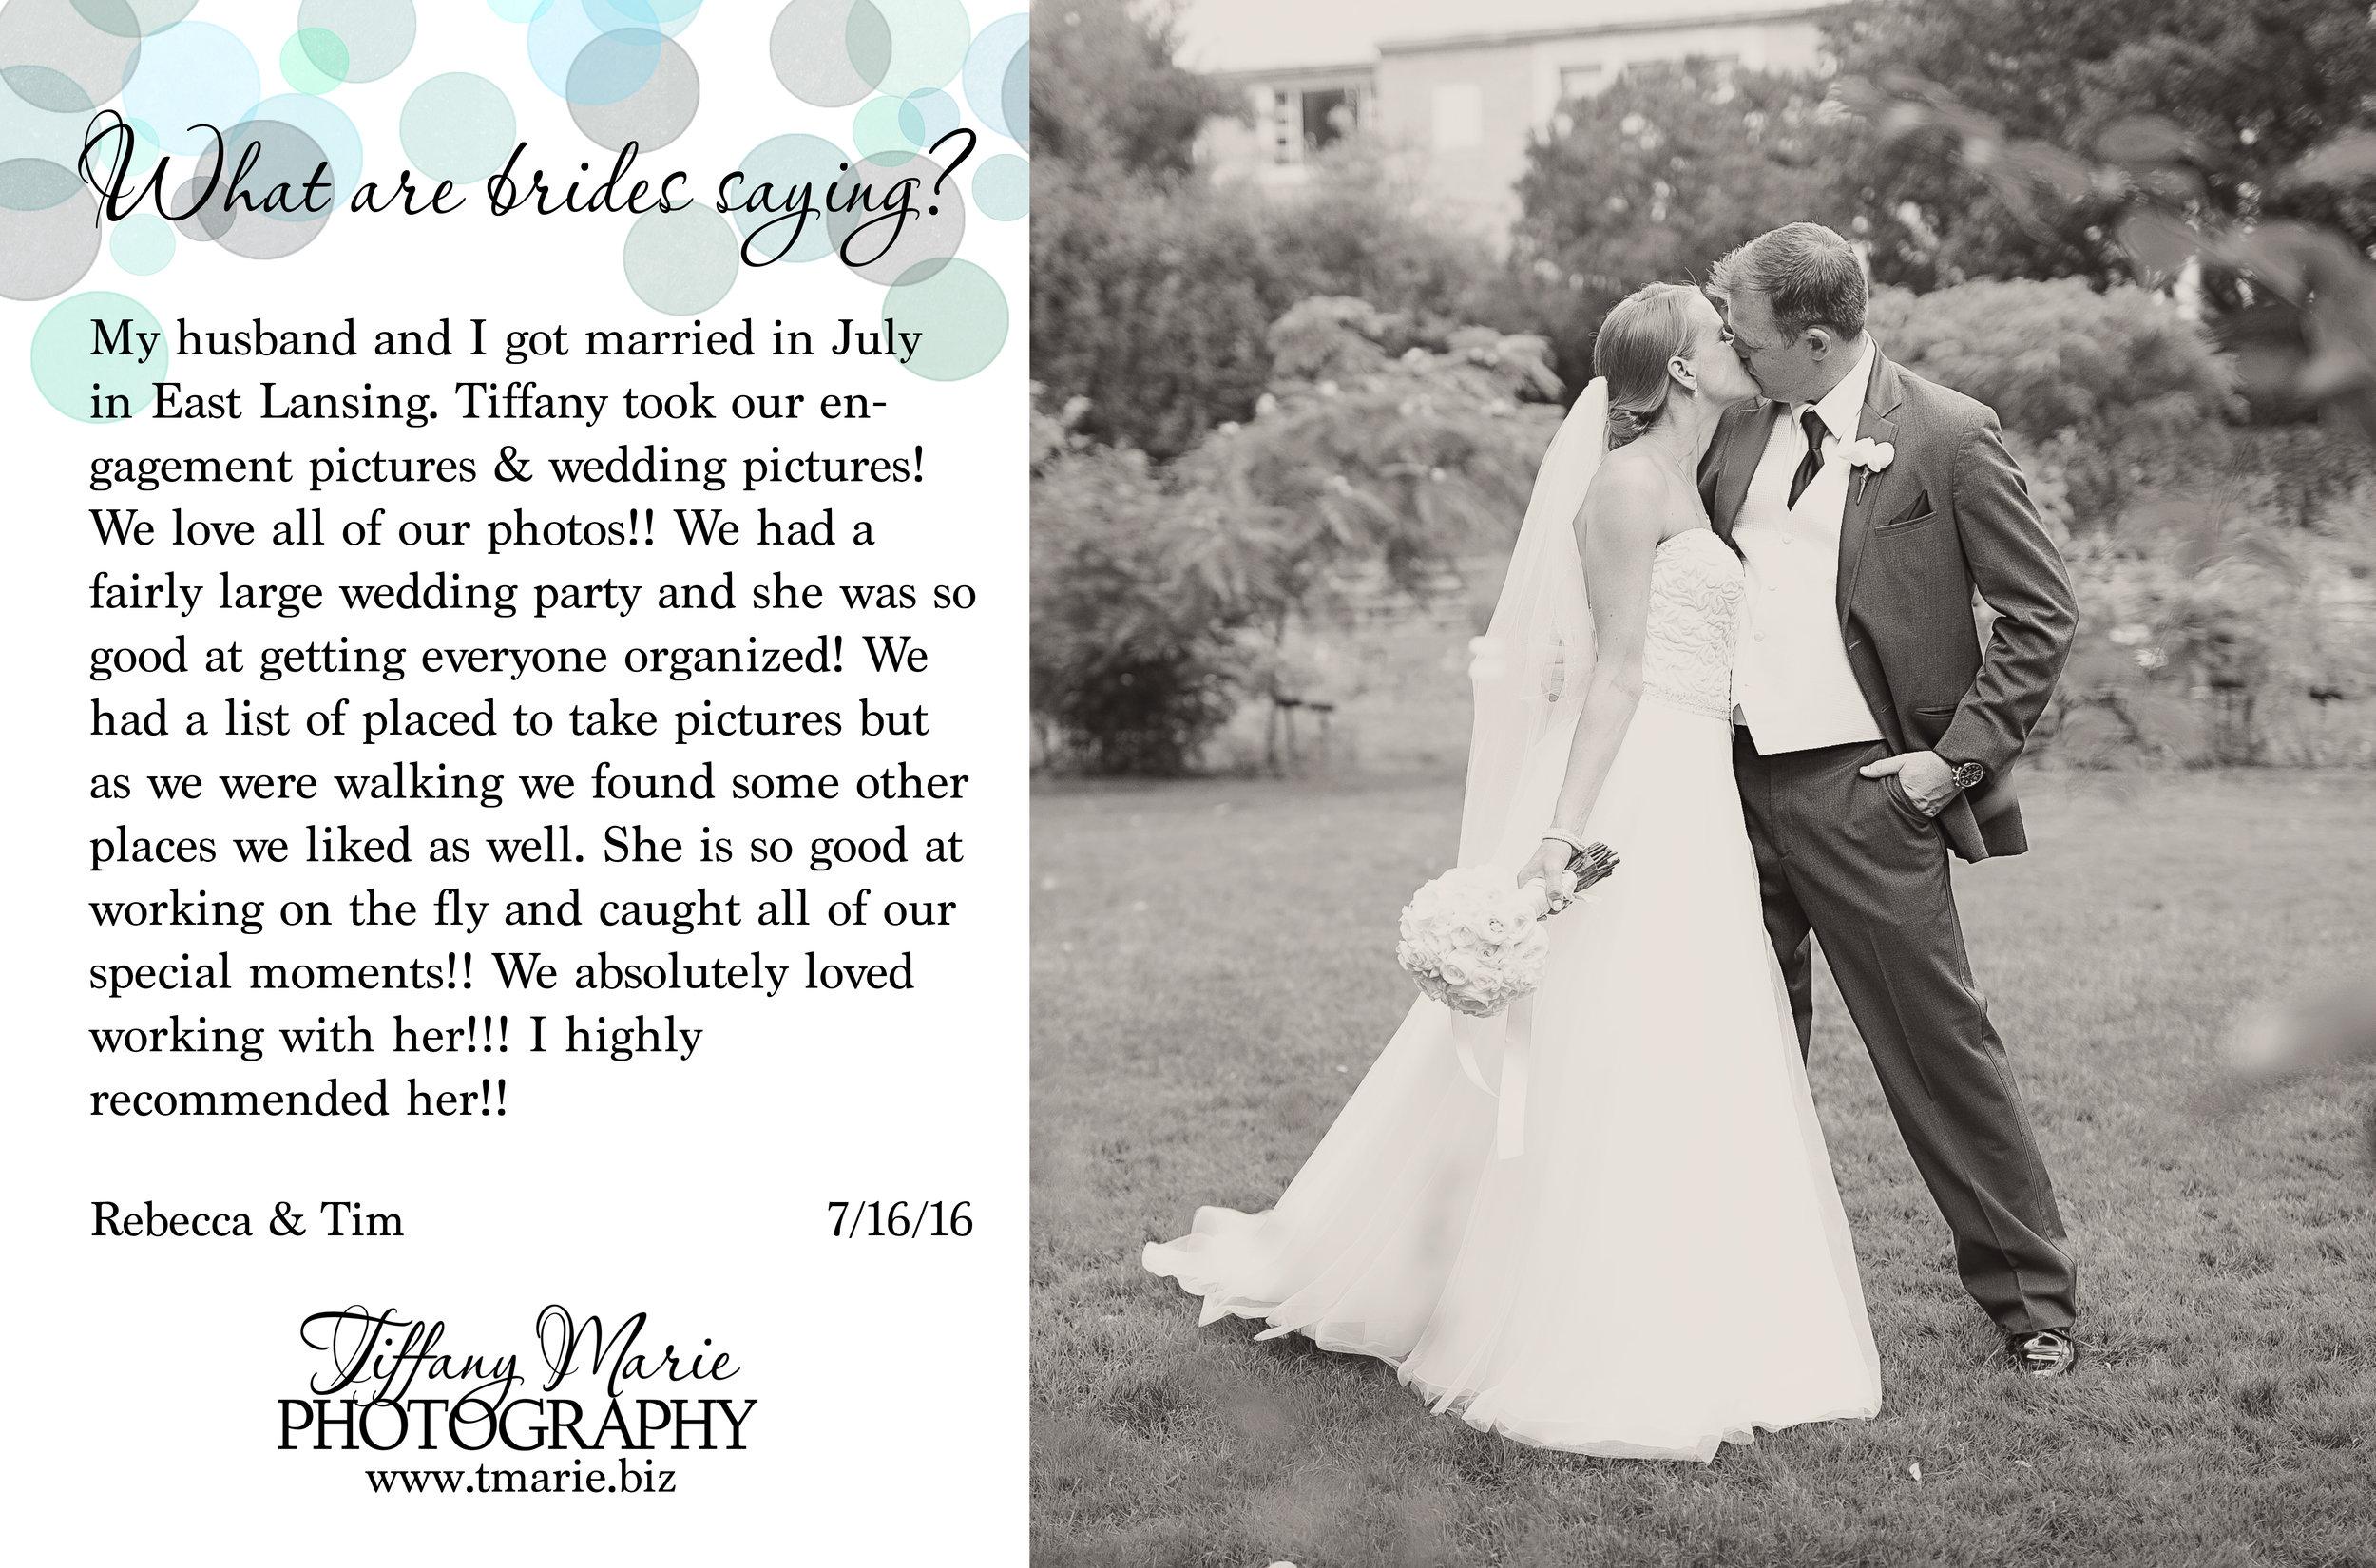 weddingreviewtiffanymariephotography1.jpg